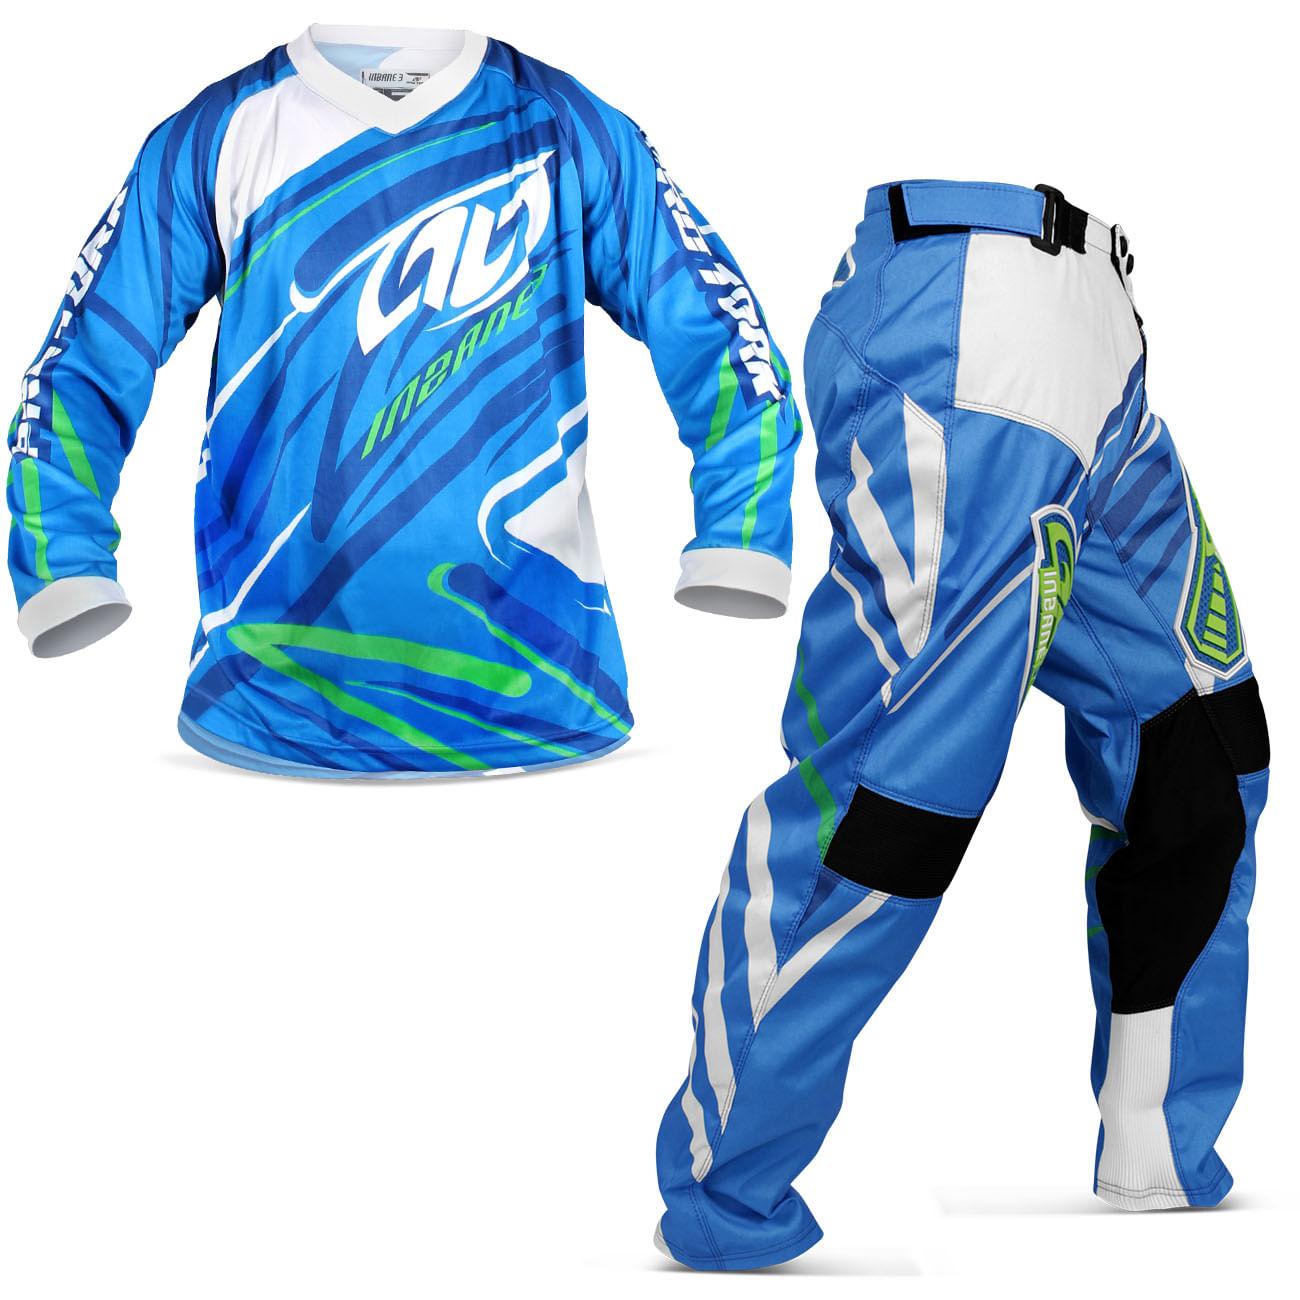 Kit Roupa Motocross Pro Tork Insane 3 Azul Camisa M Calça 38